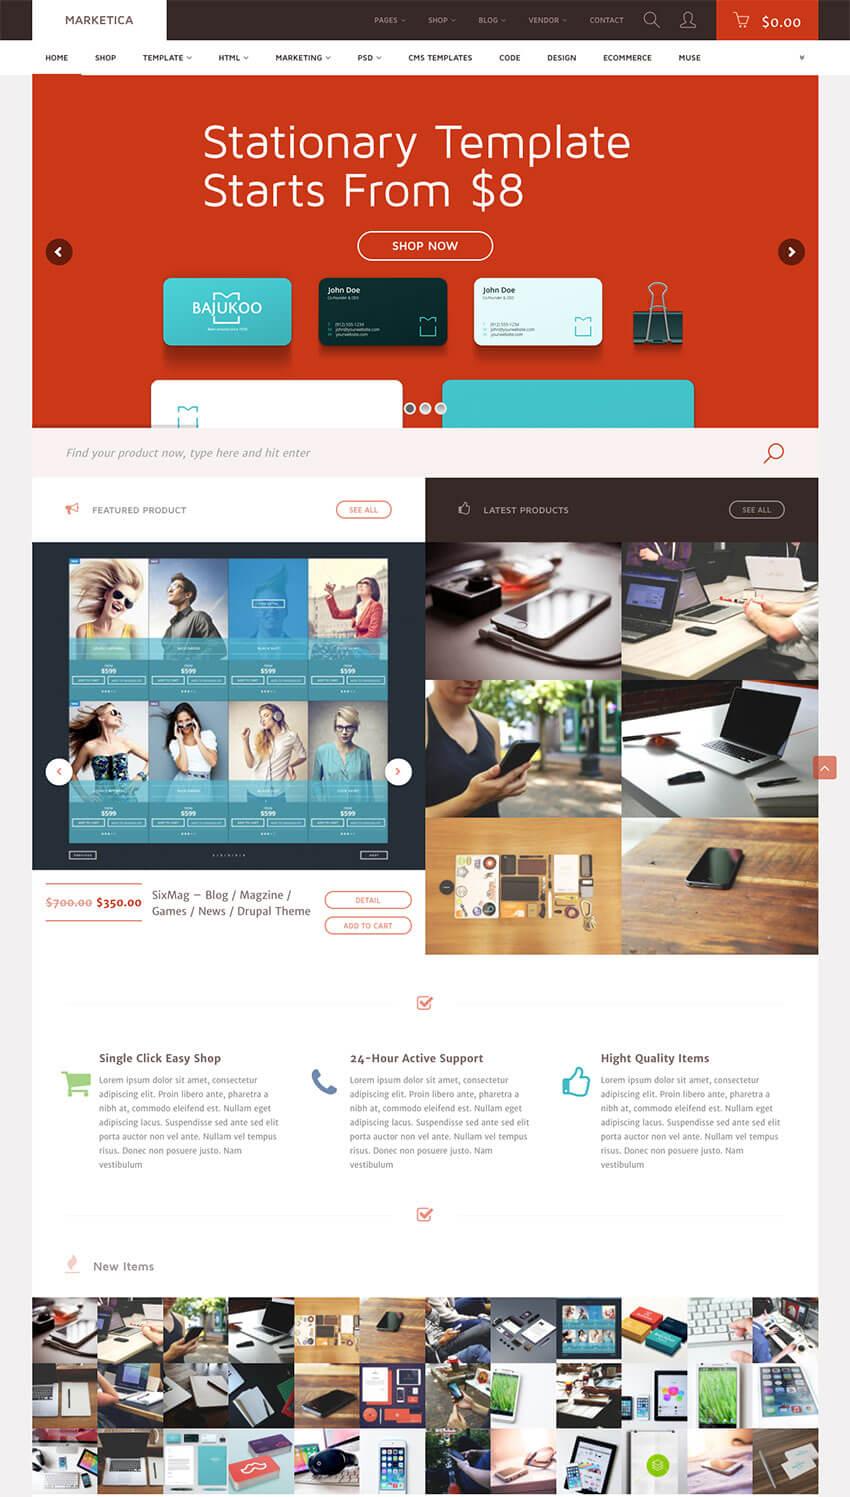 Marketica eCommerce Marketplace WordPress Theme